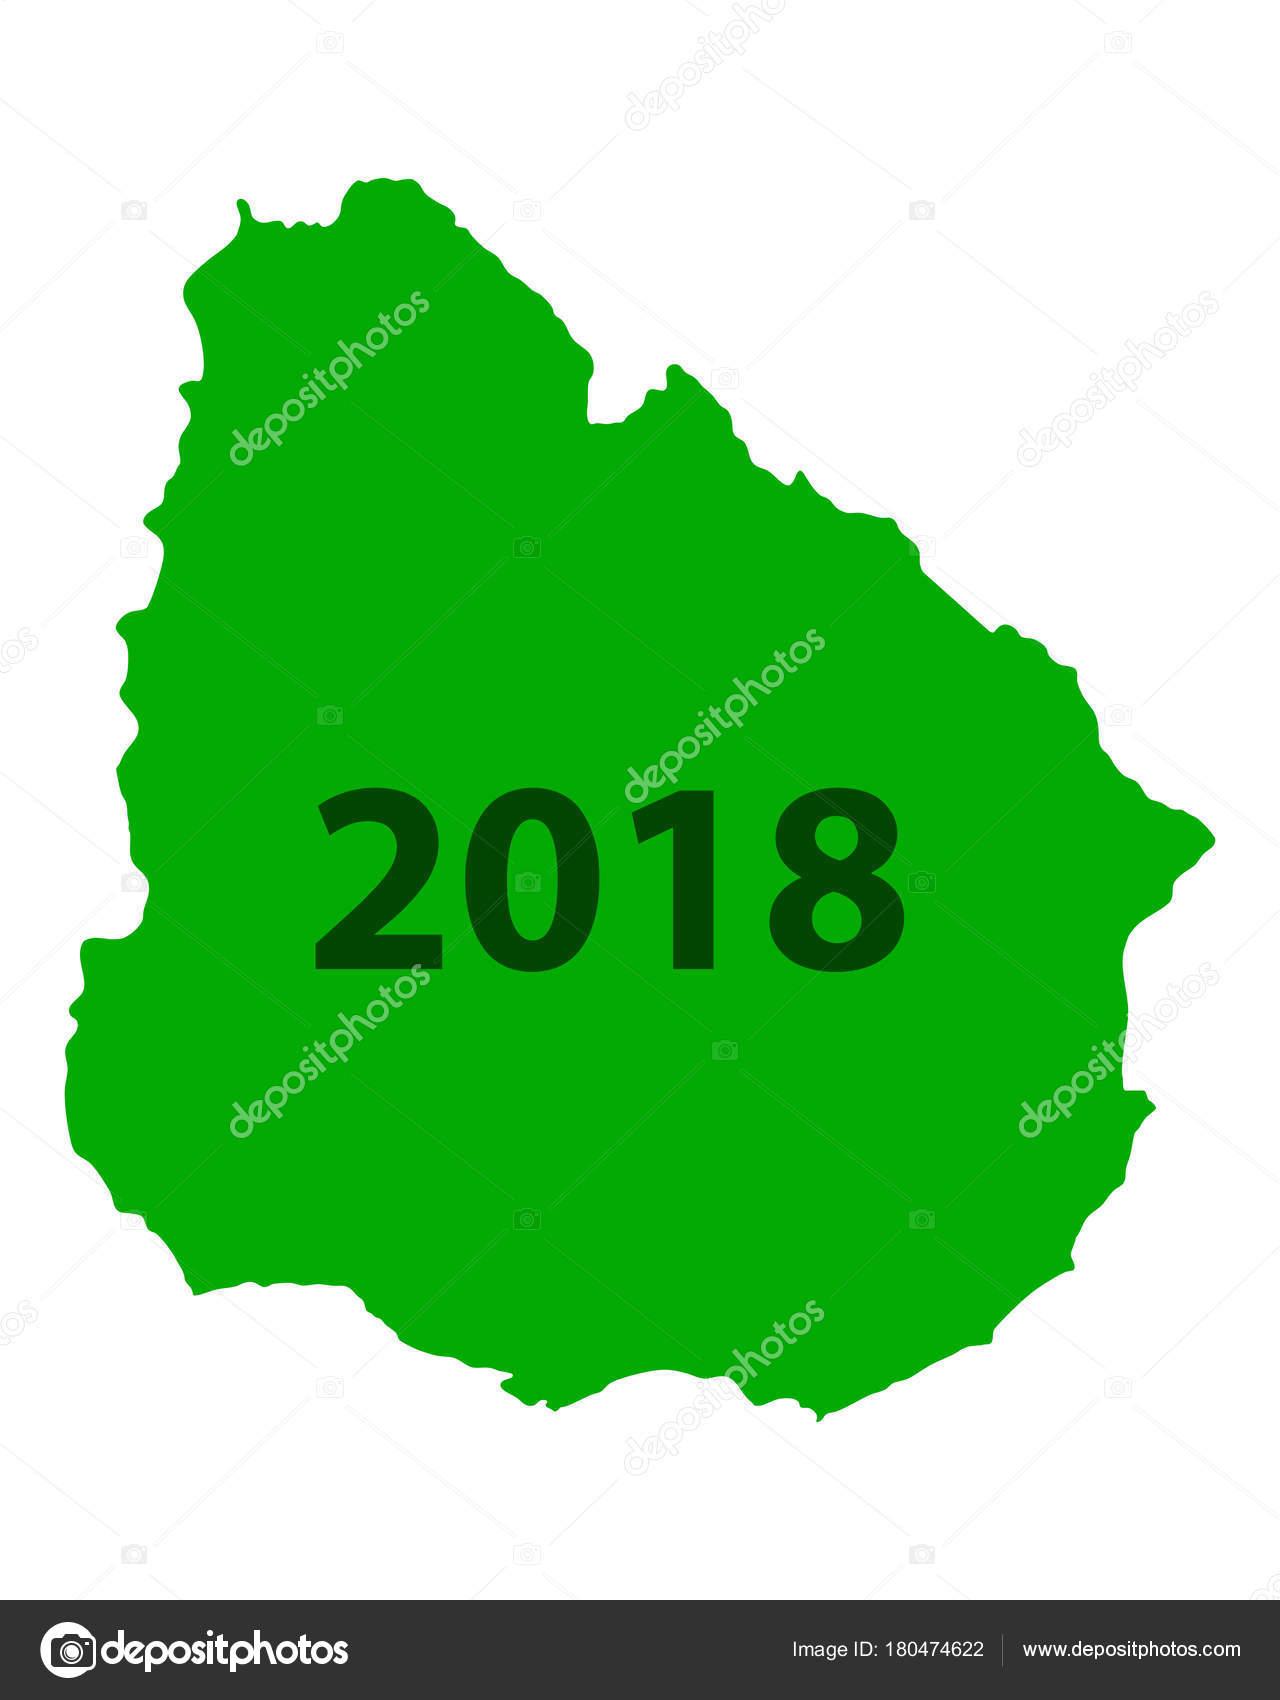 Map of Uruguay 2018 — Stock Vector © rbiedermann #180474622